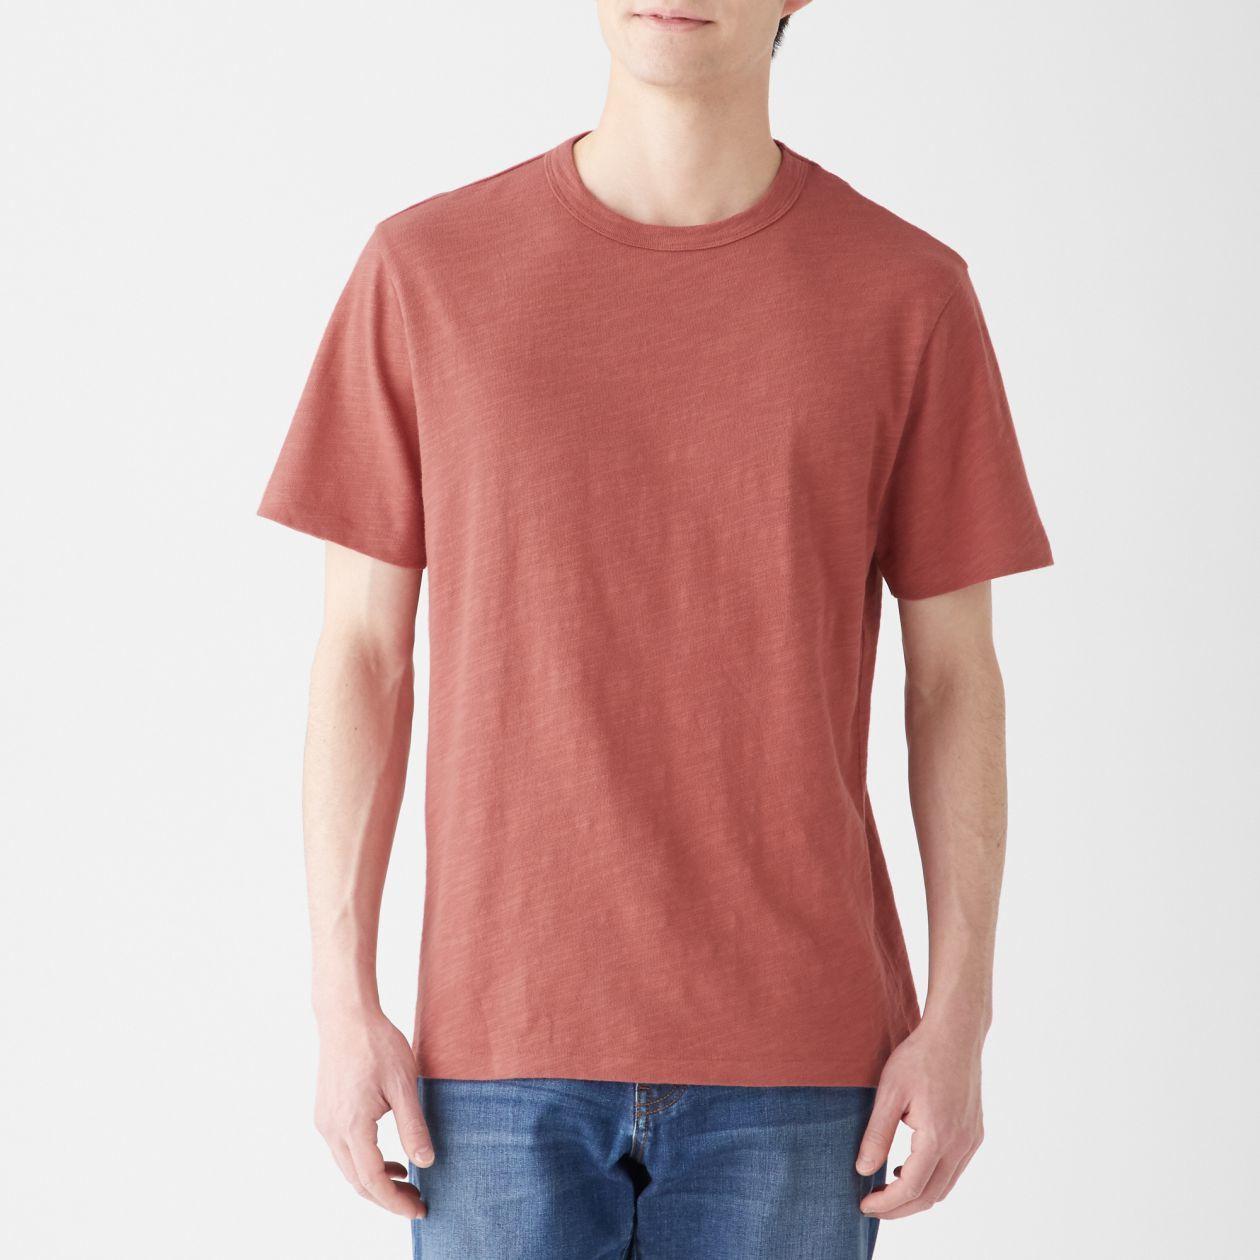 MUJI無印良品男印度棉節紗圓領短袖T恤,從原價650元調降為450元。圖/無印...